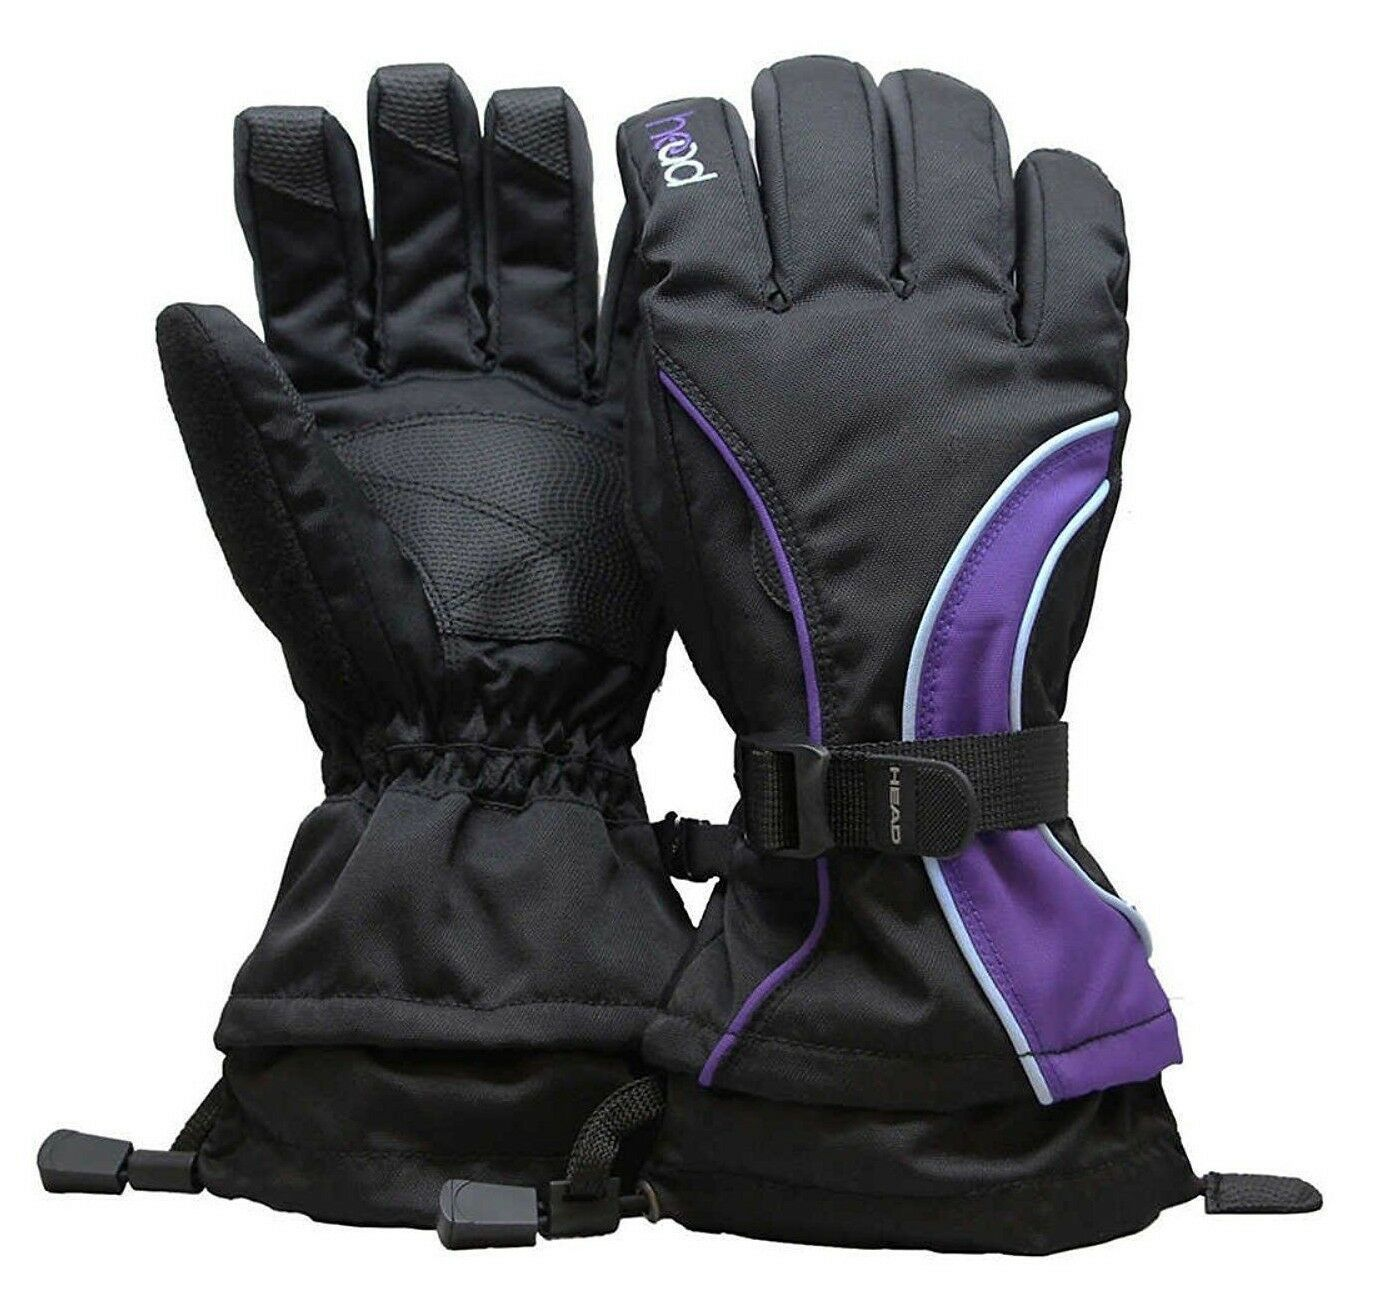 Head Junior Jr Black Purple Blue Insulated Ski Snowboard Winter Gloves M/6-10